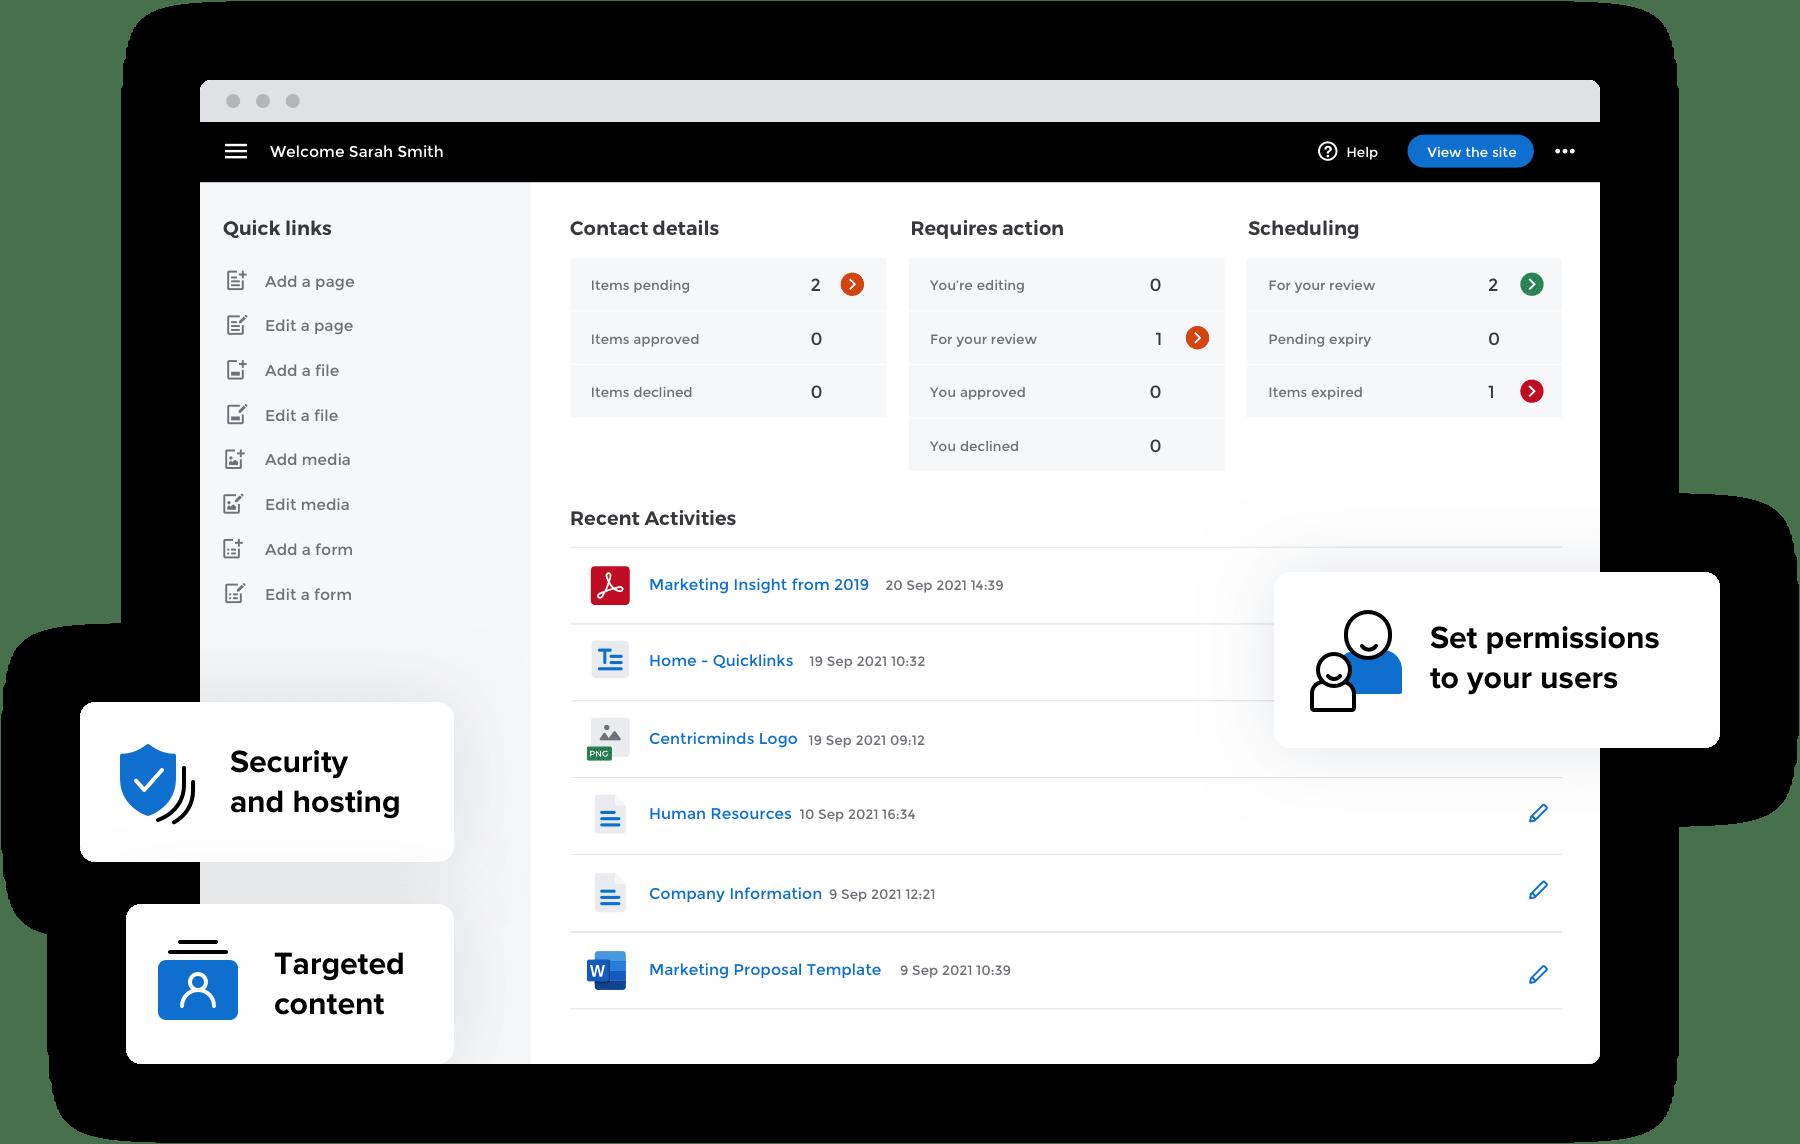 CentricMinds Digital Experience Platform